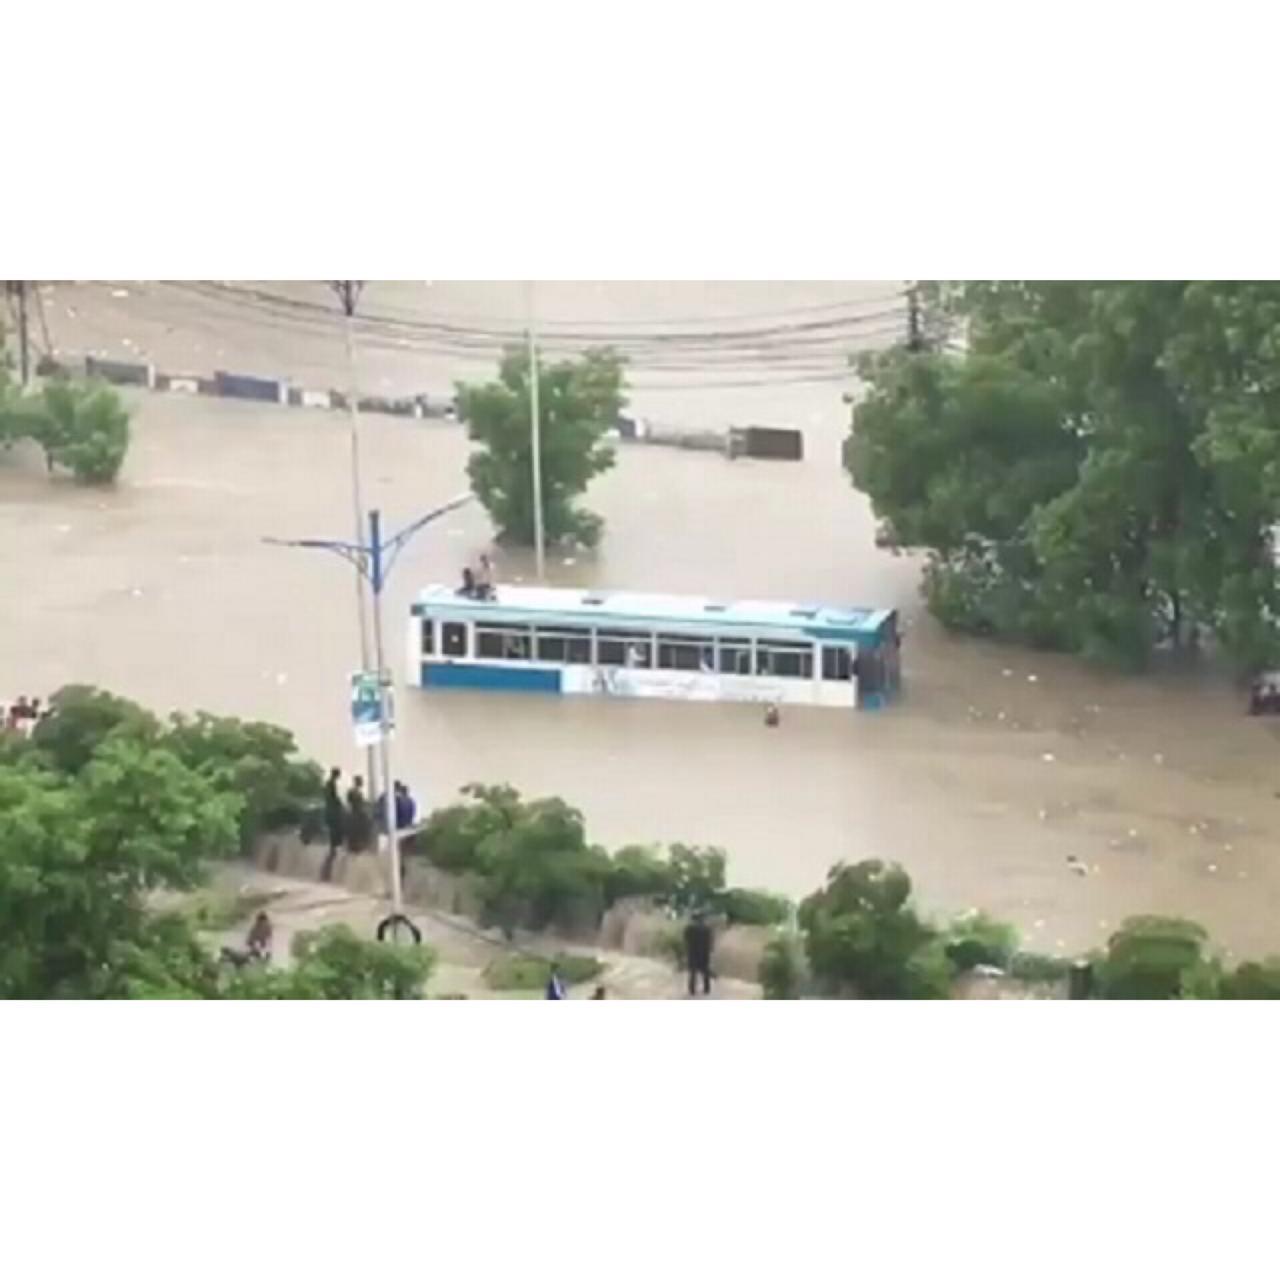 a bus carrying dow university staffers stuck in rainwater at nursery sharea faisal photo express file